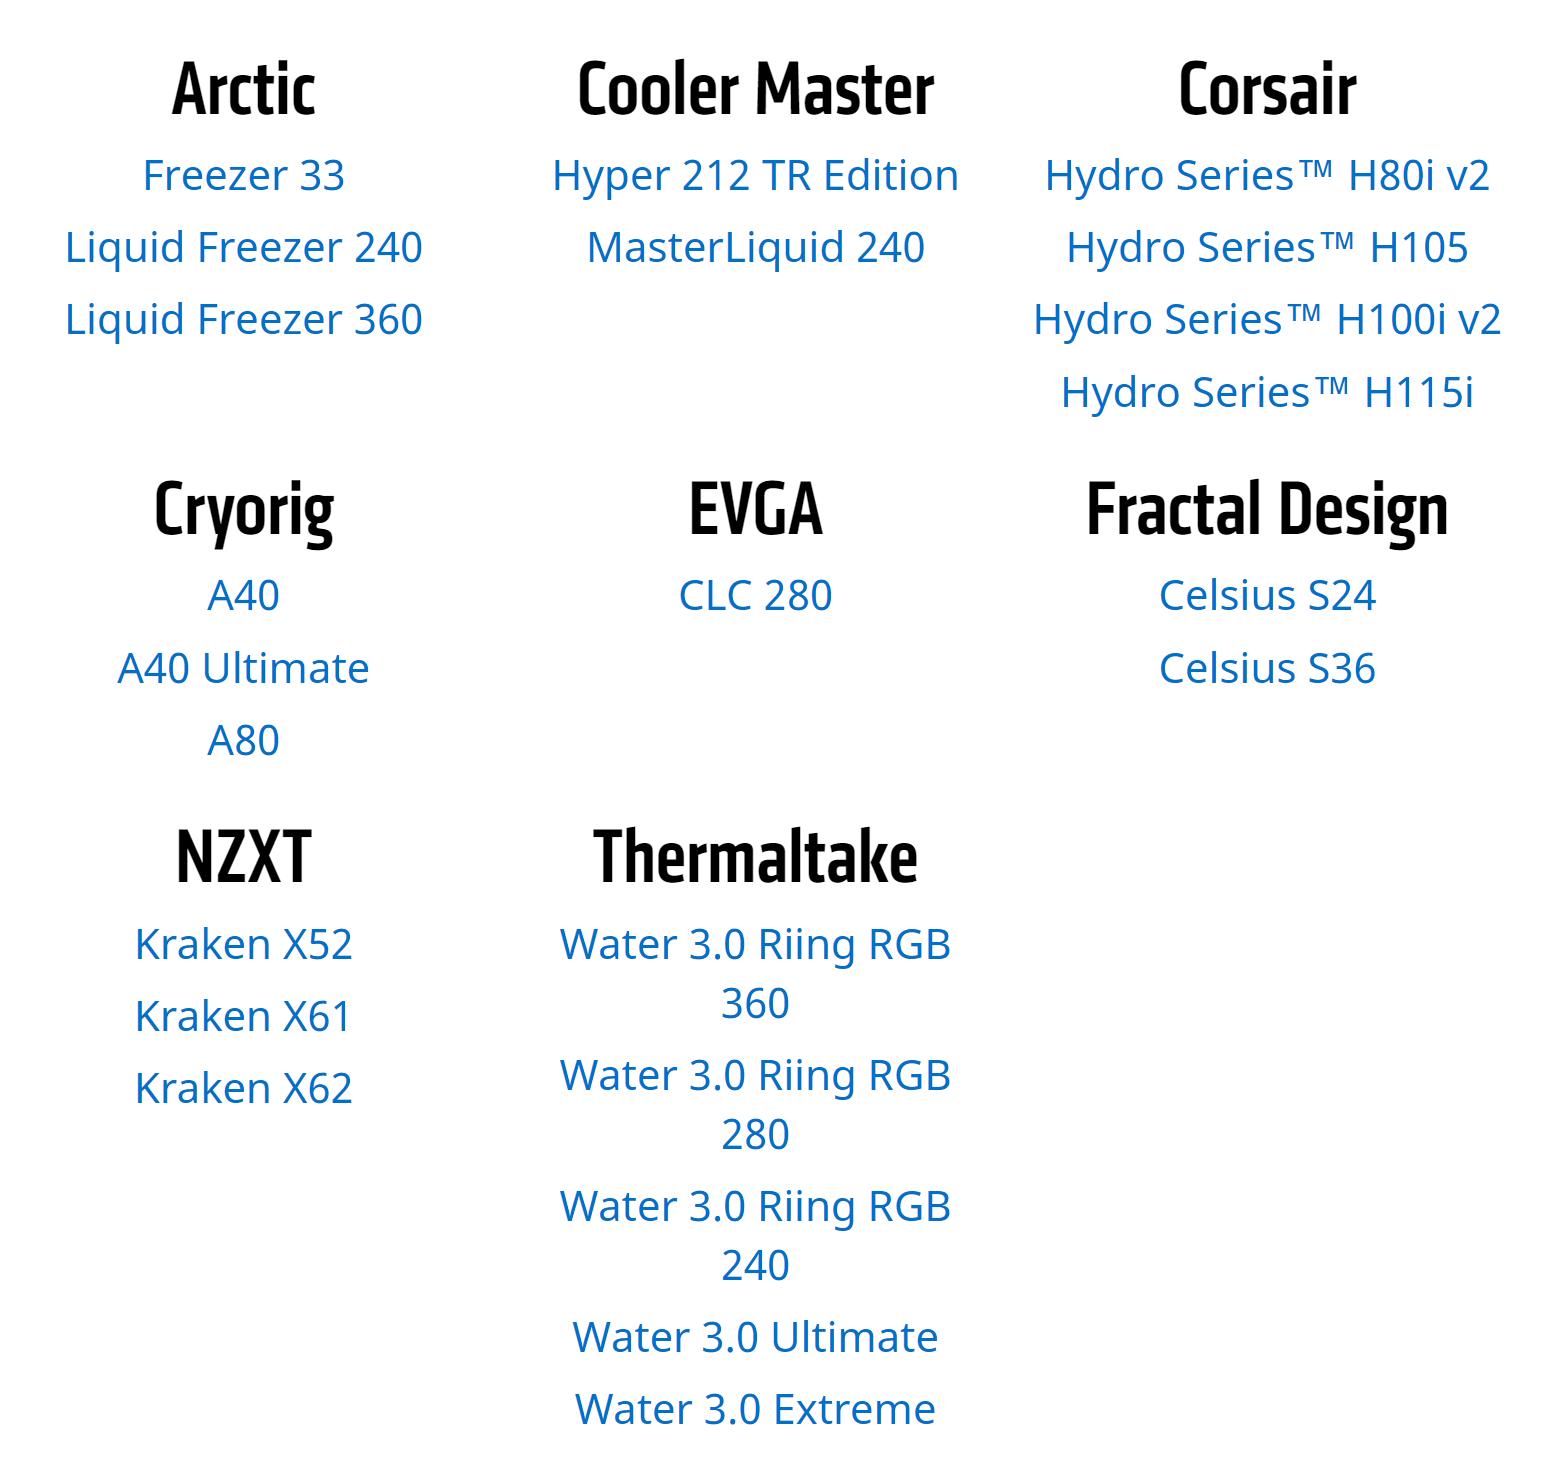 AMD Ryzen Threadripper 1950X 1920X